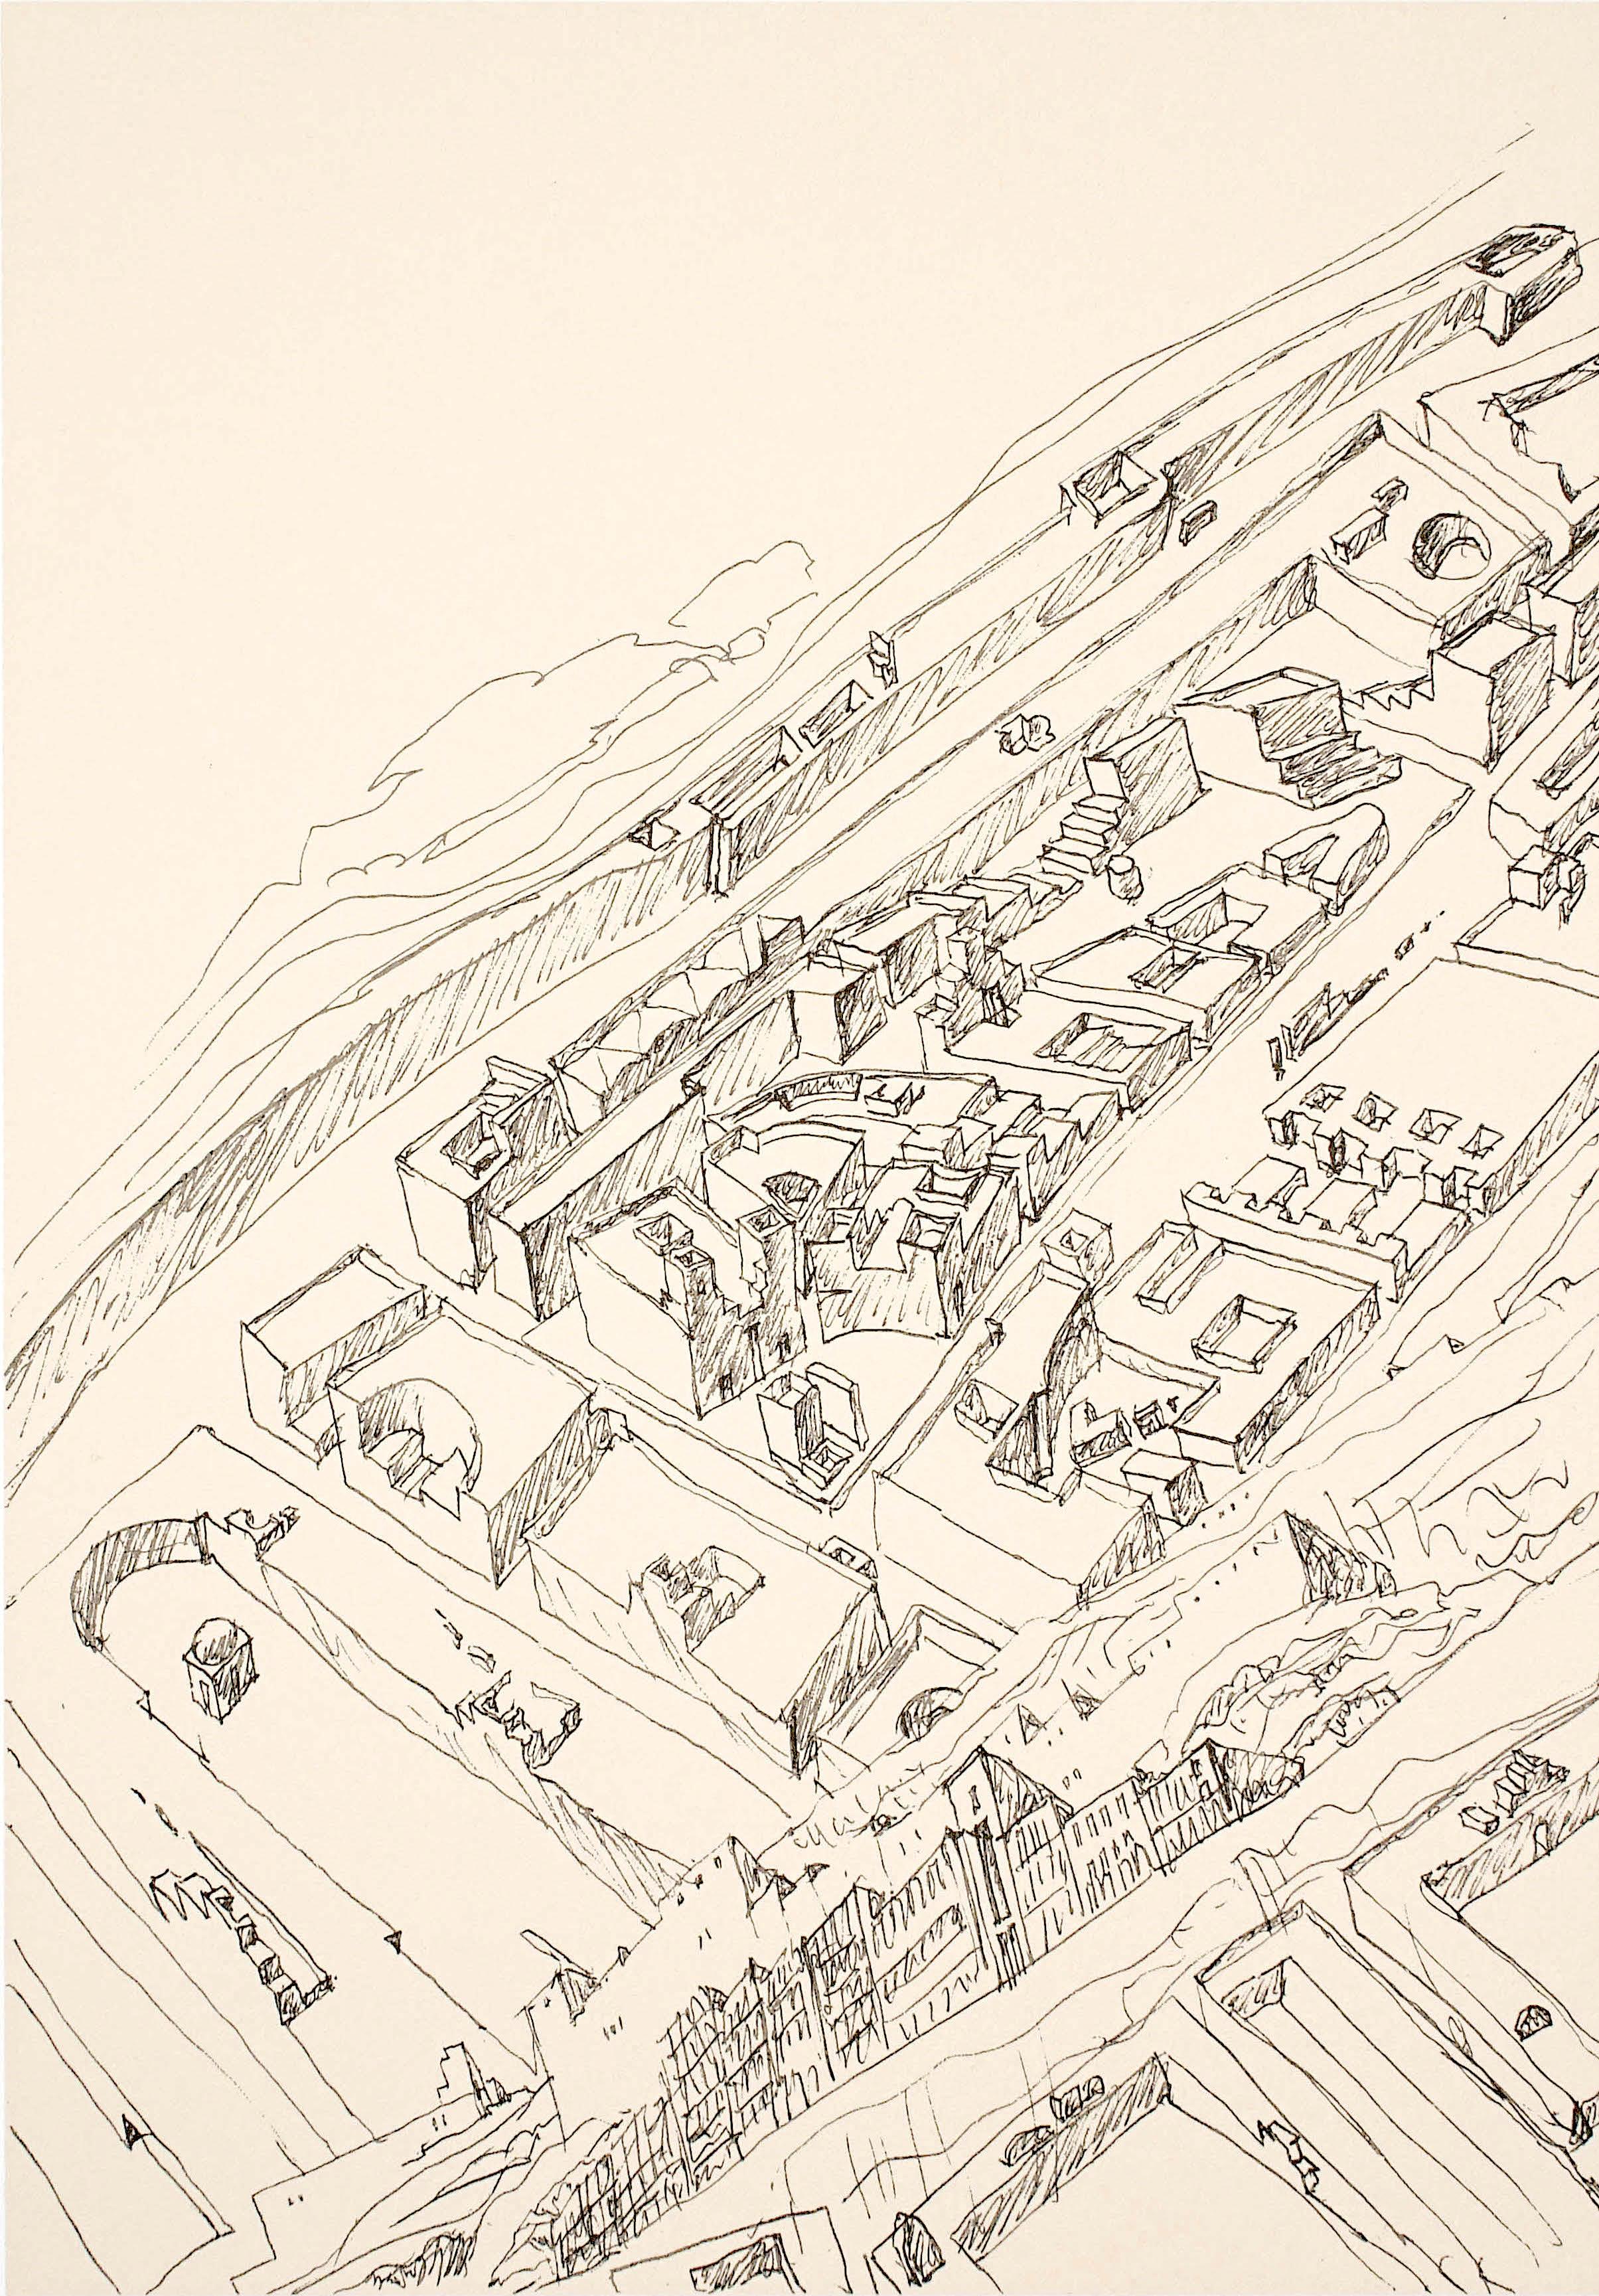 A drawing by architect Álvaro Siza.